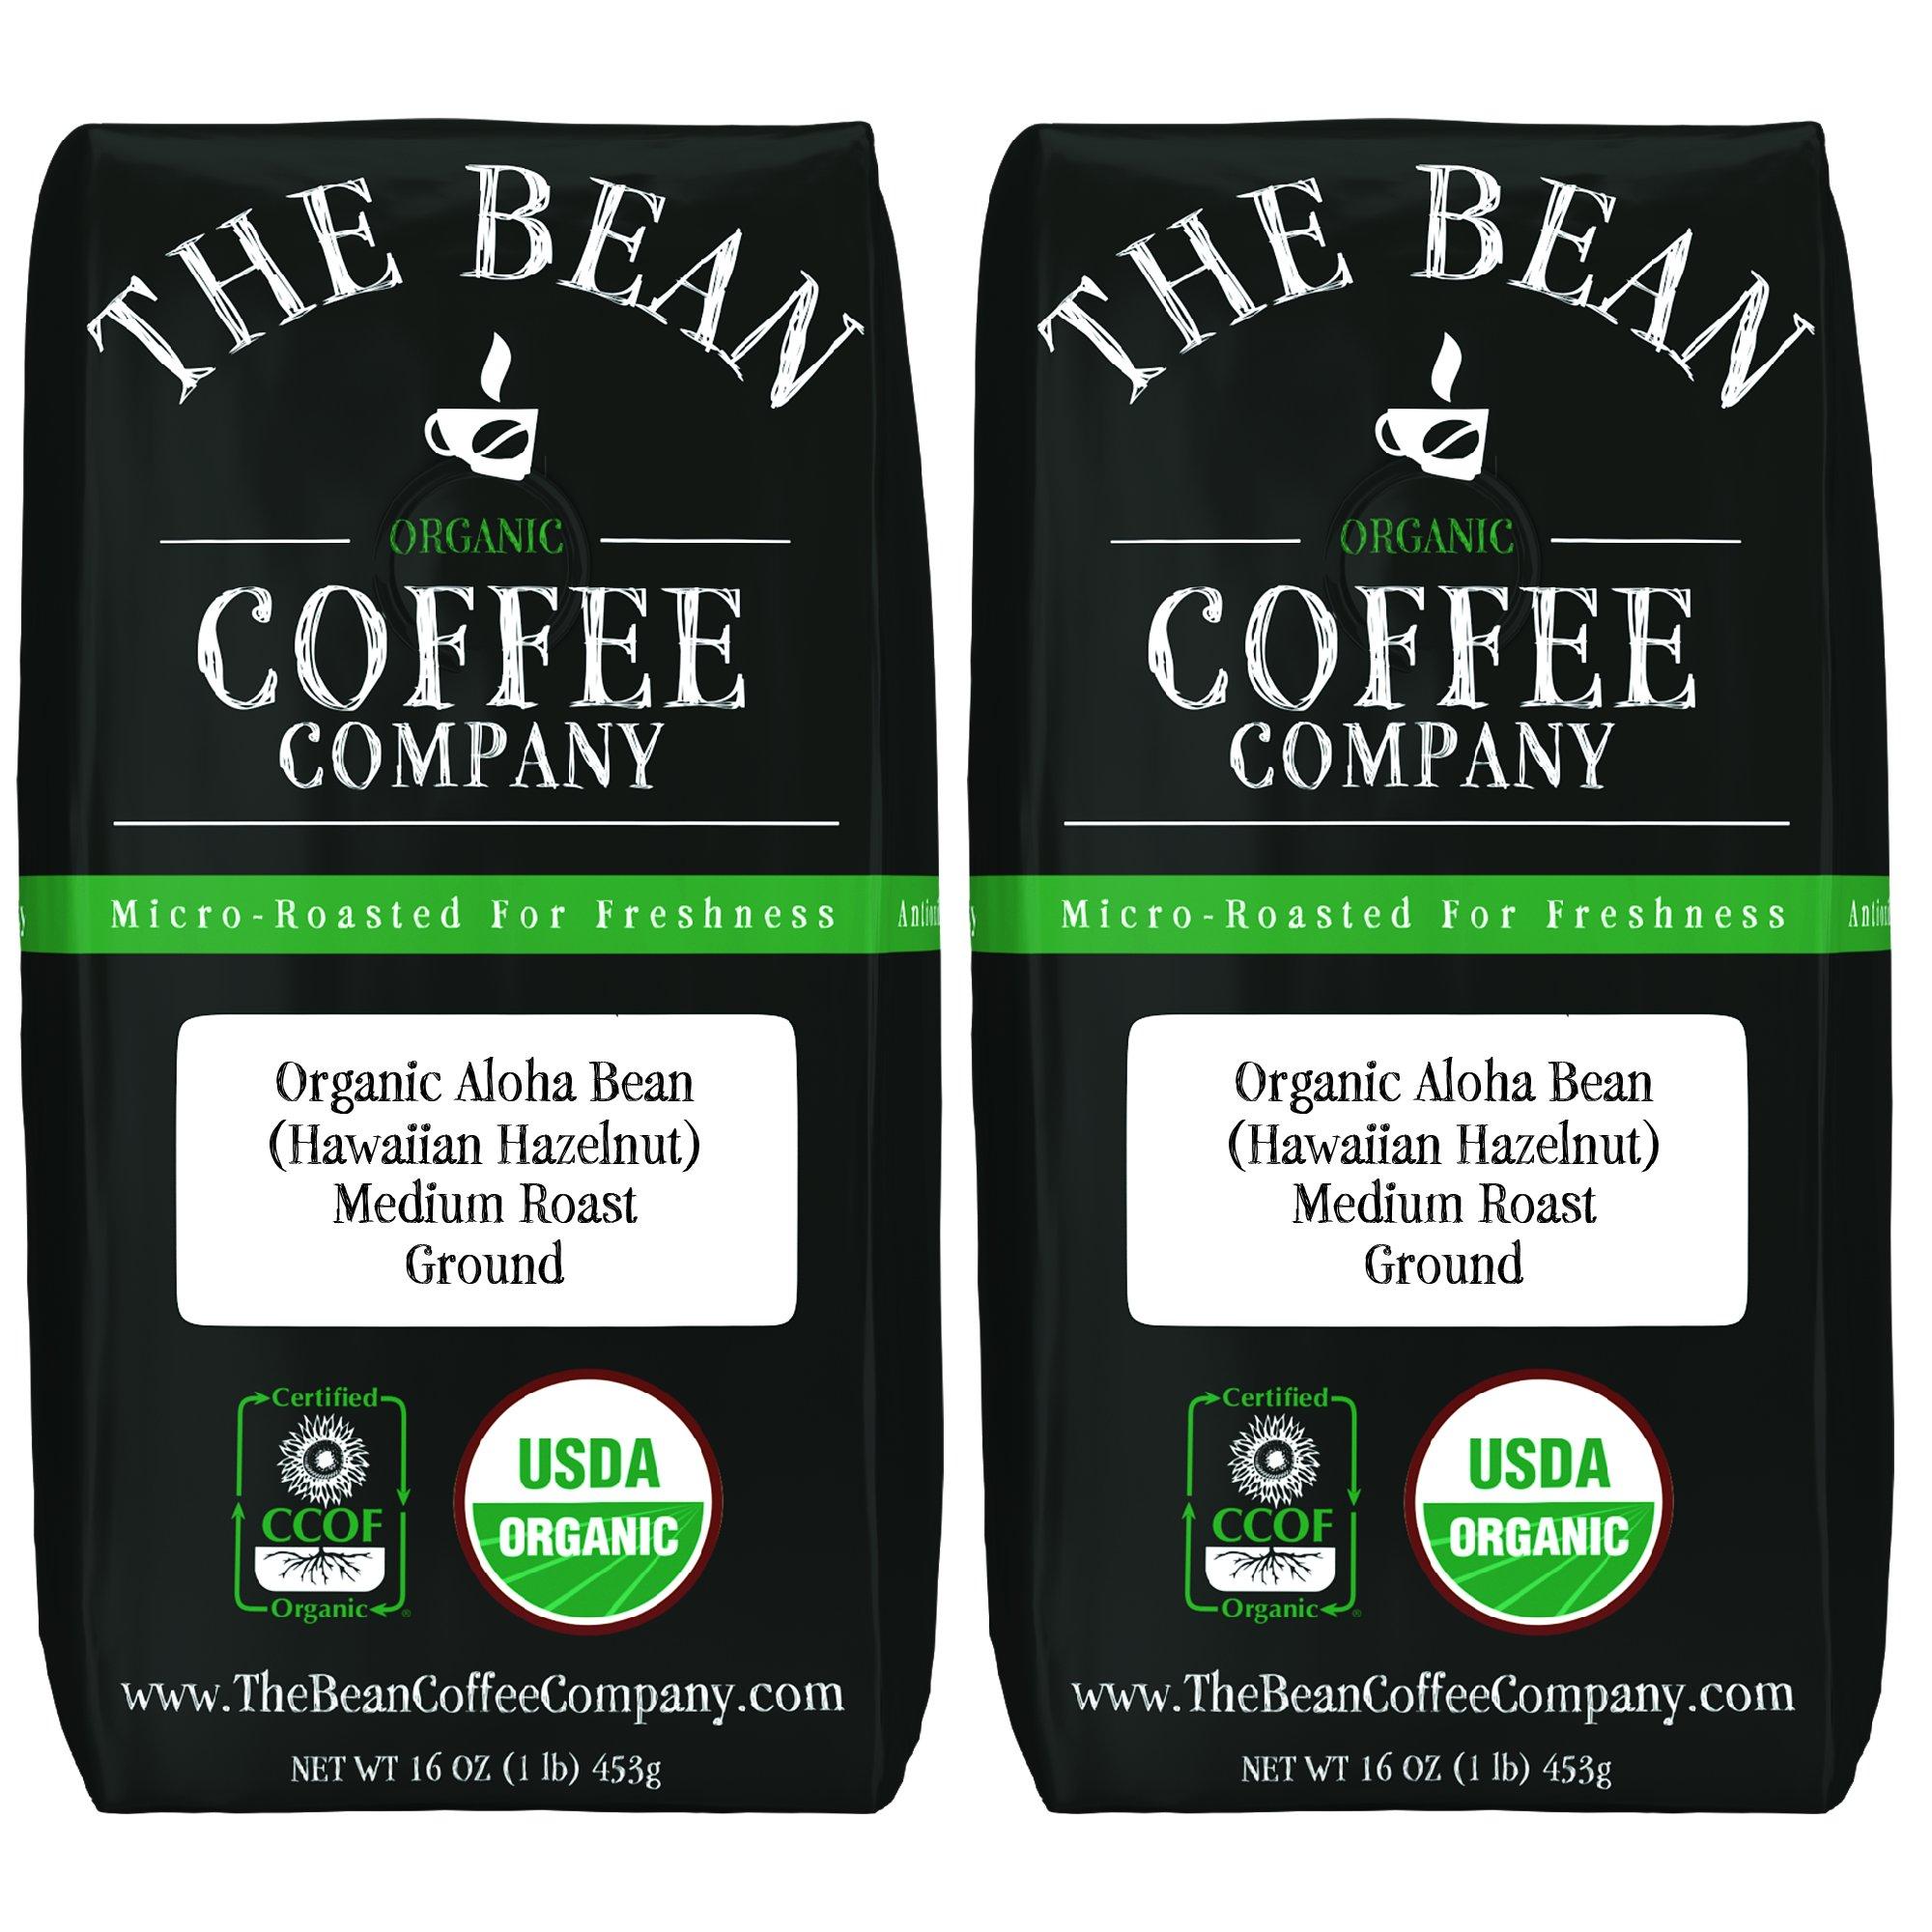 The Bean Coffee Company Organic Aloha Bean (Hawaiian Hazelnut), Medium Roast, Ground, 16-Ounce Bags (Pack of 2)